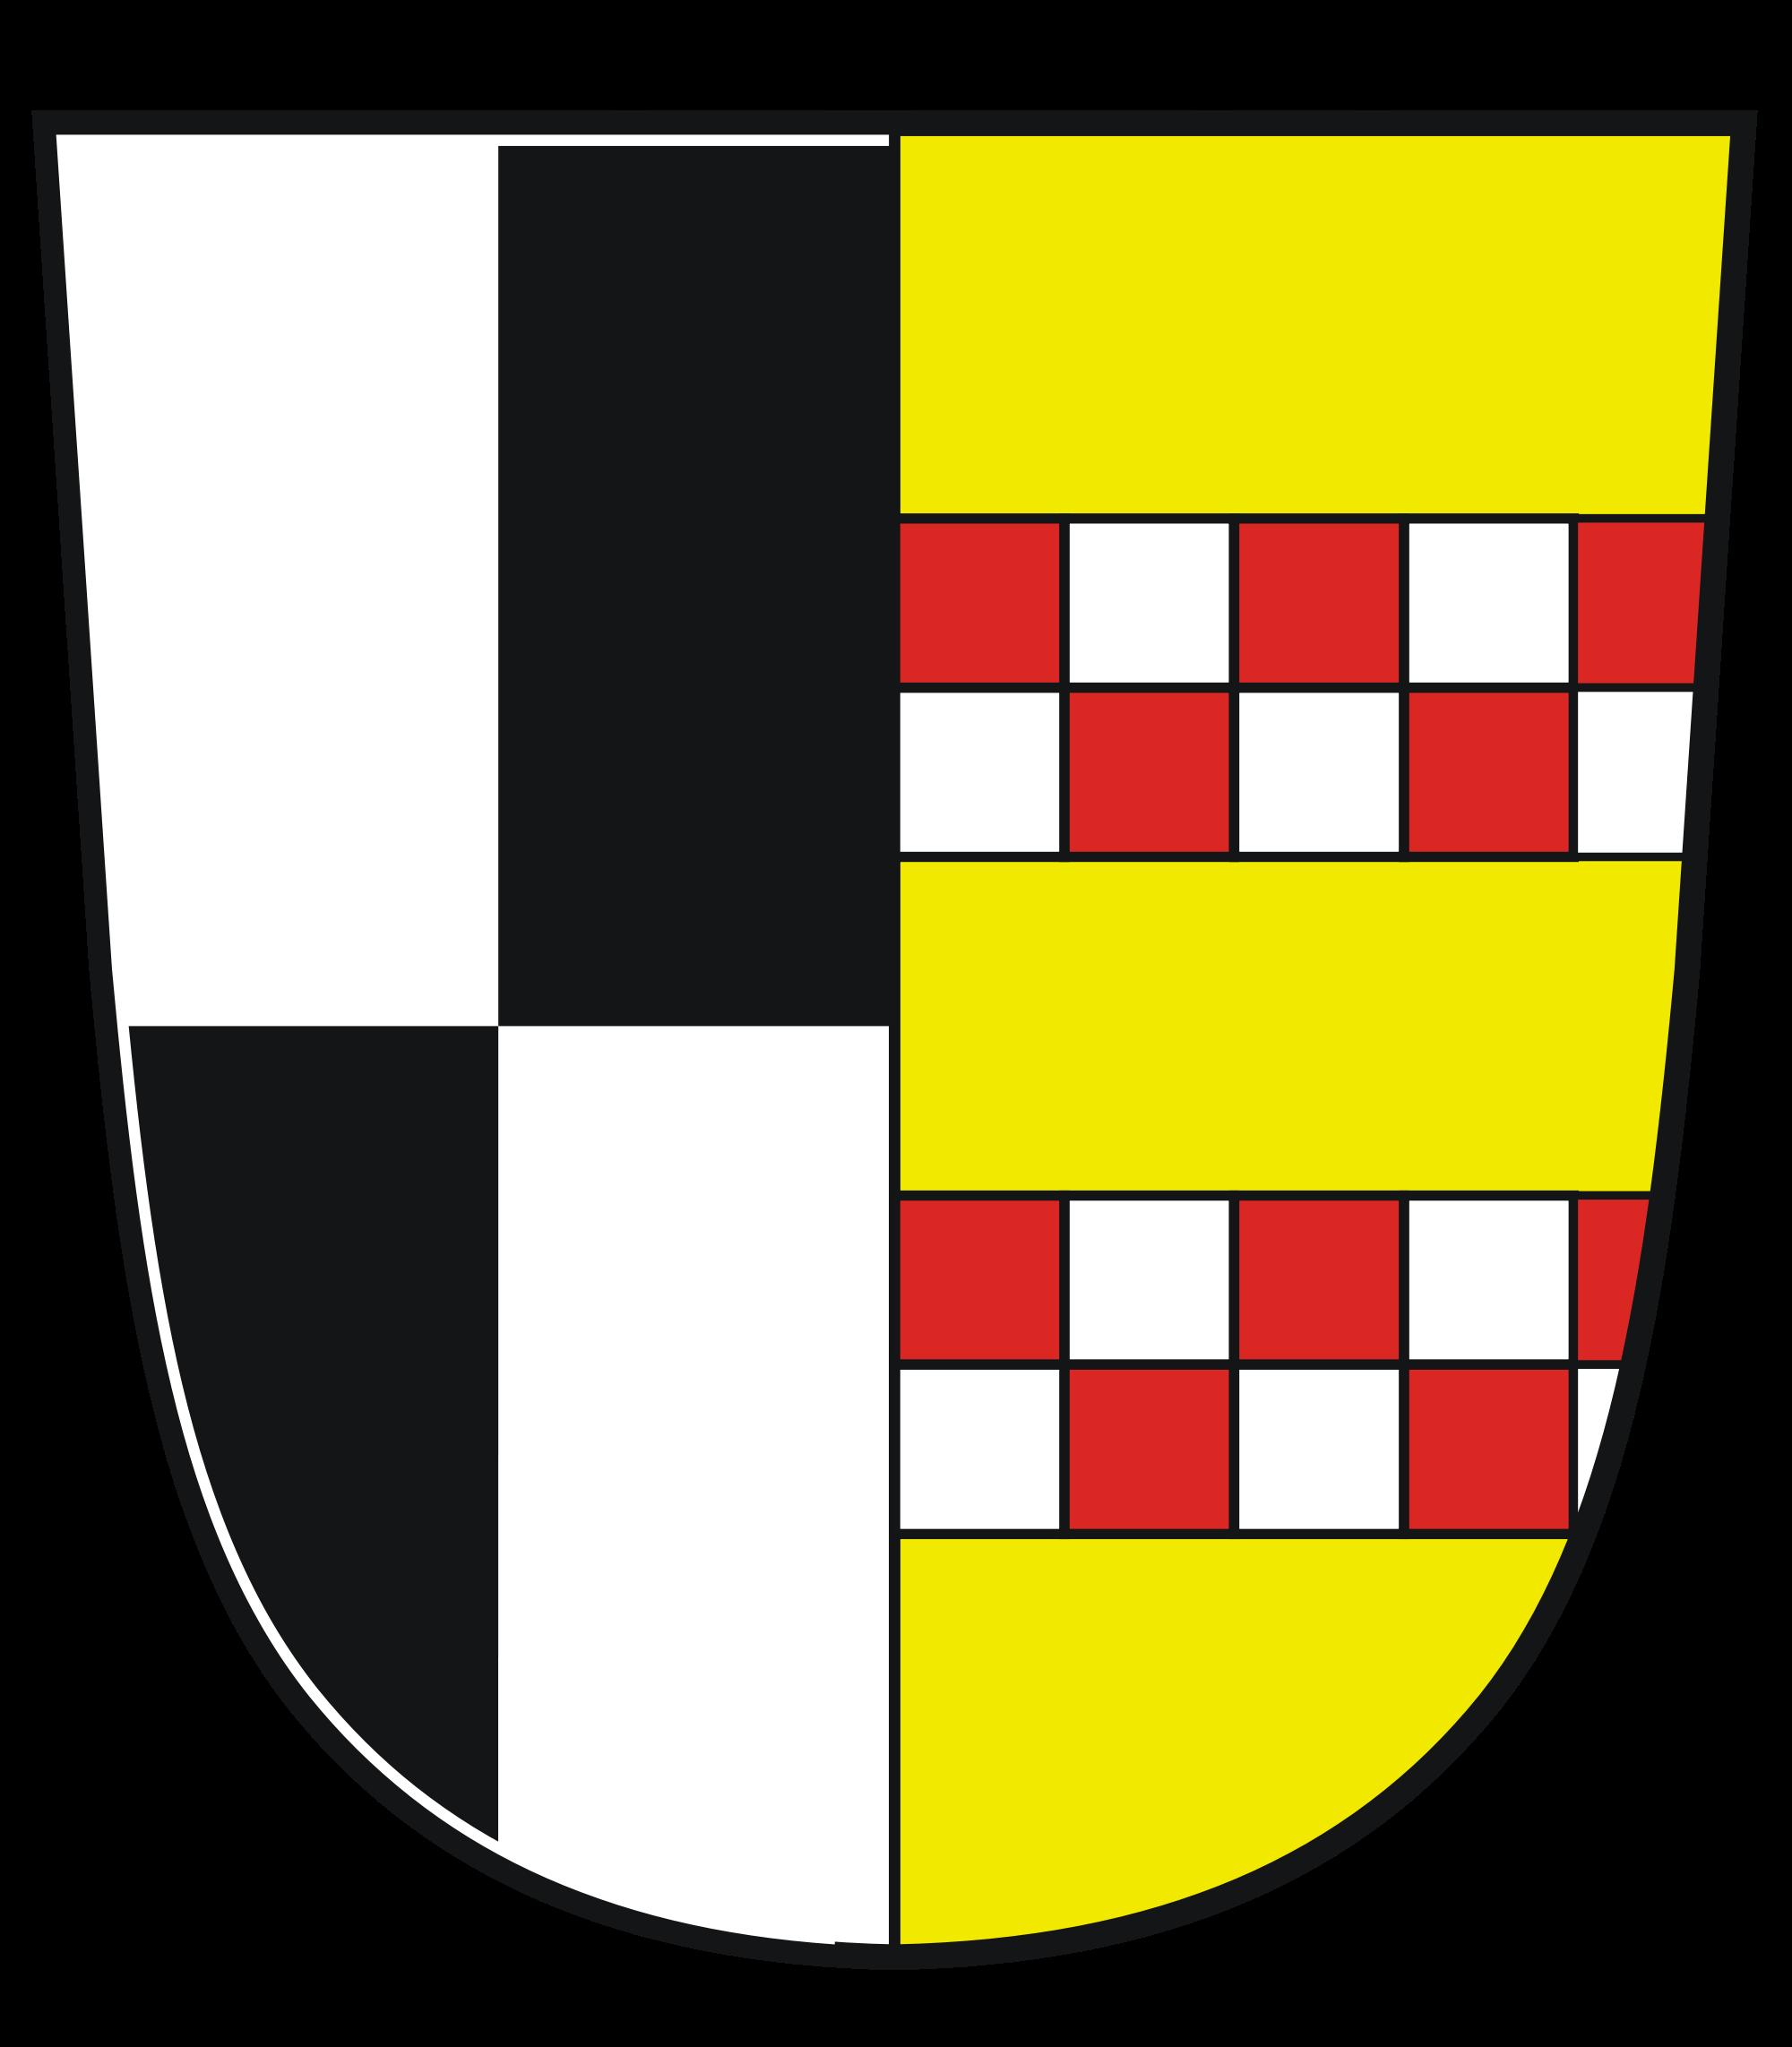 File:Wappen uehlfeld.svg.